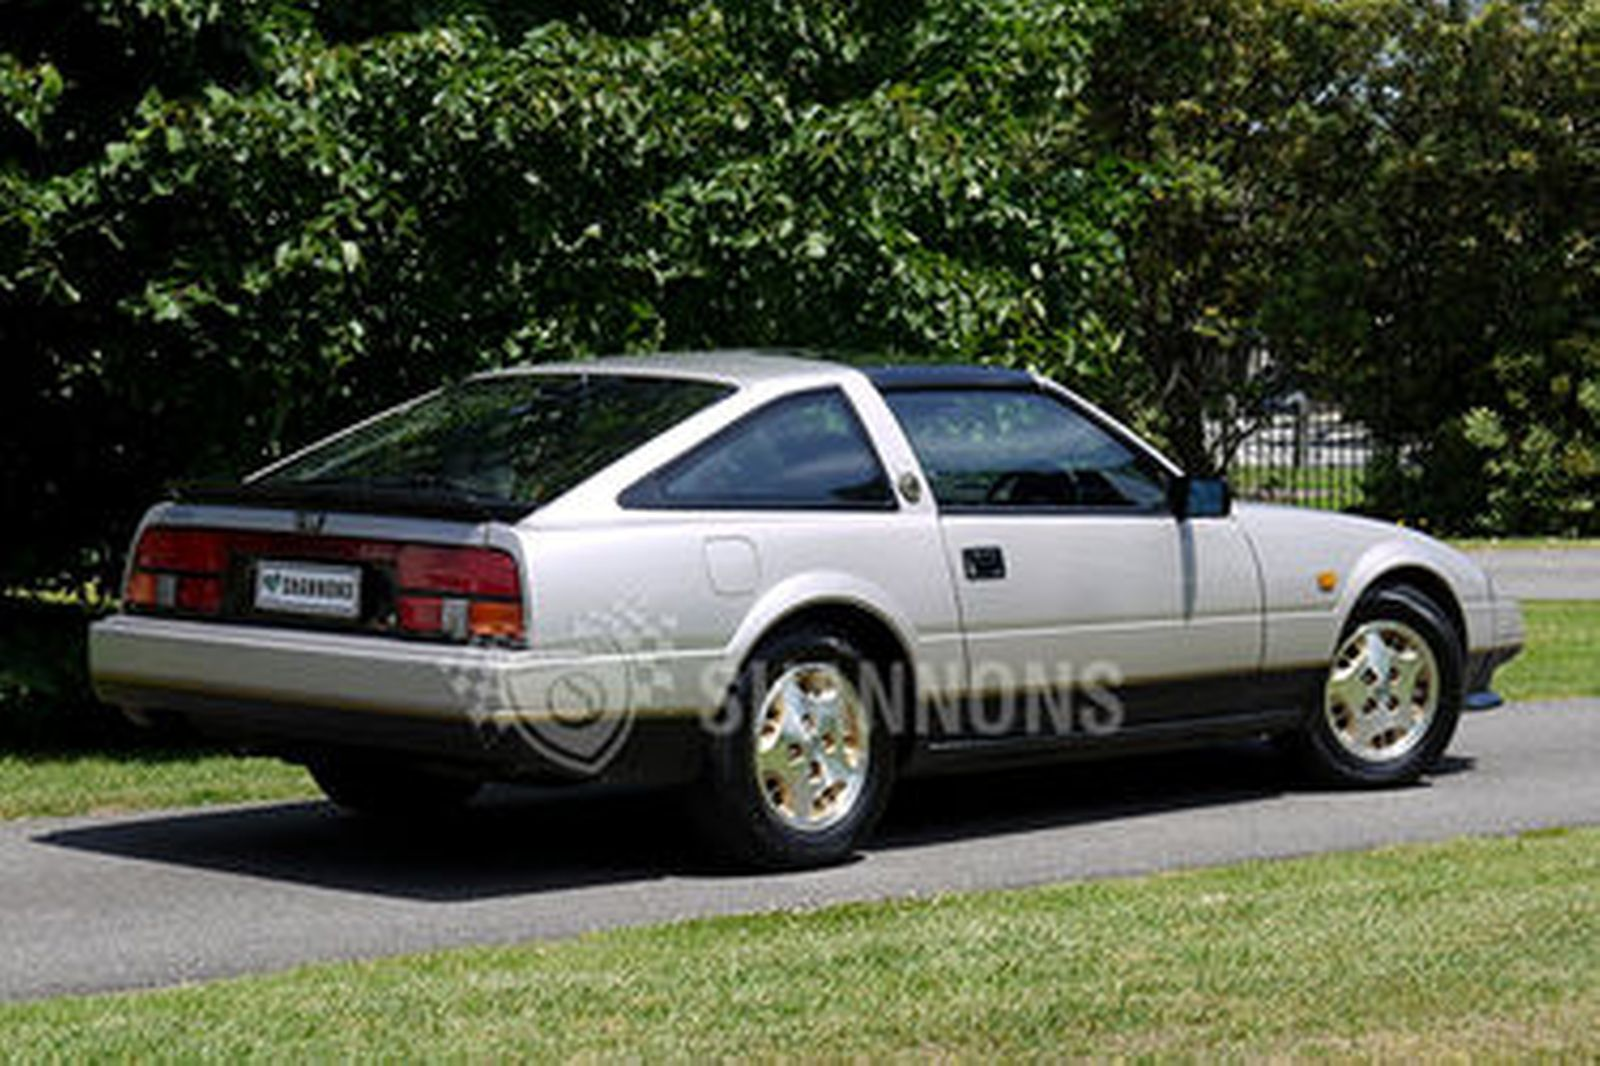 Nissan Zx Targa Coupe